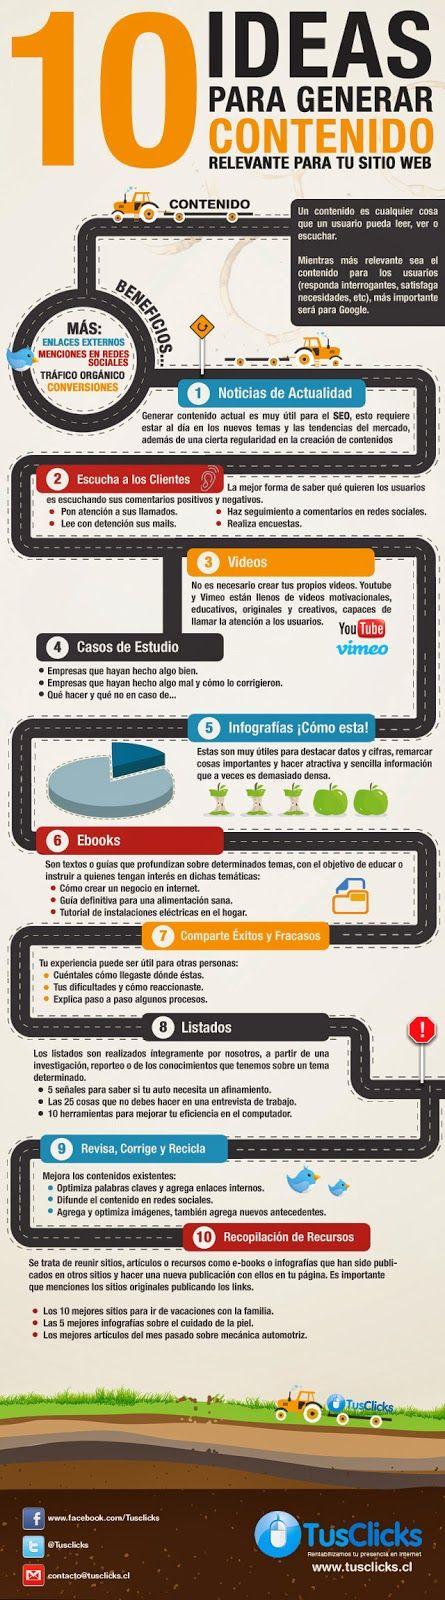 10 ideas para generar contenido relevante para tu sitio web. #infographic #infográfico